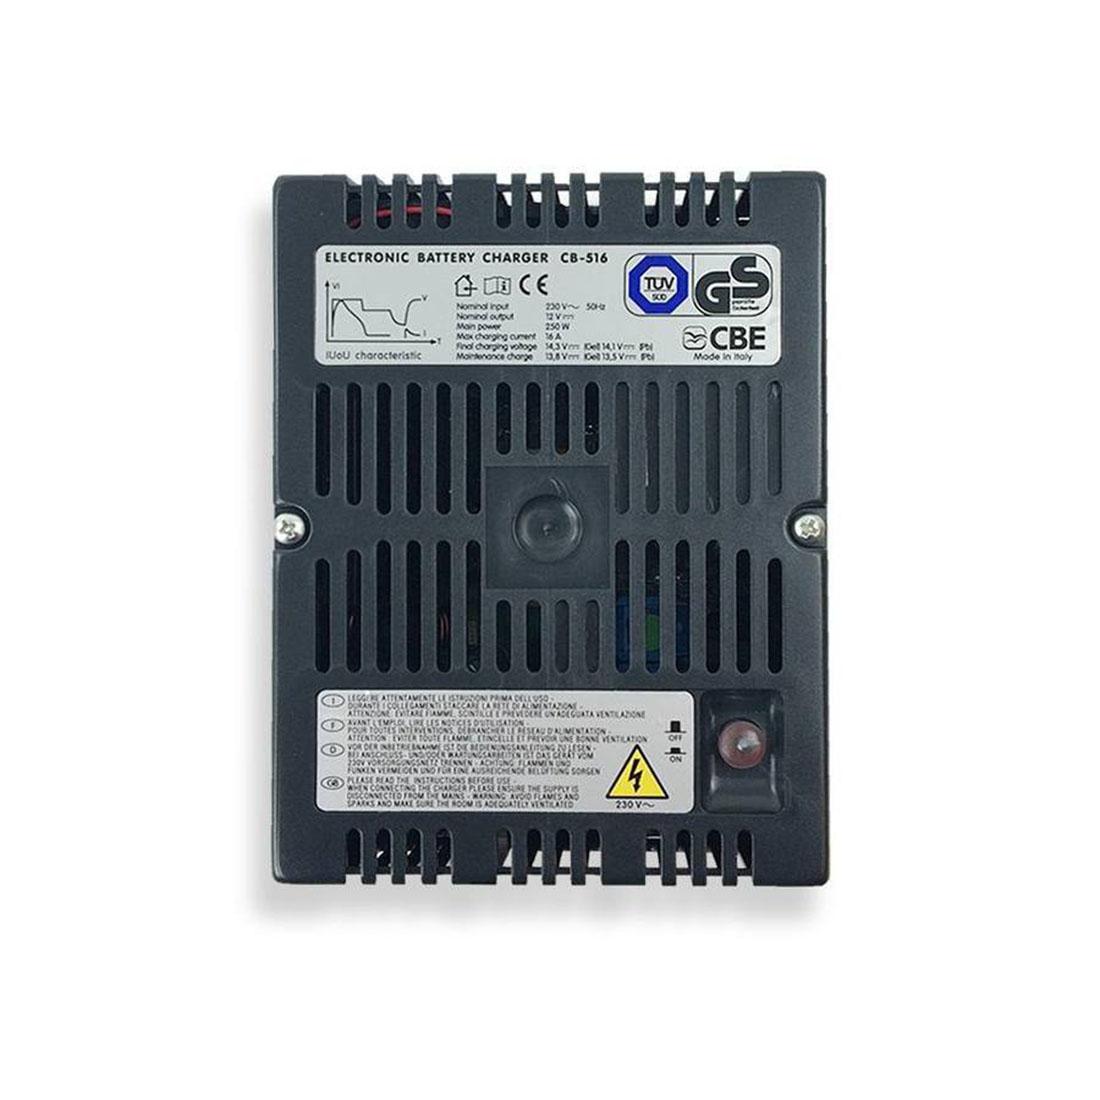 PC180 camper conversion power management system bottom.